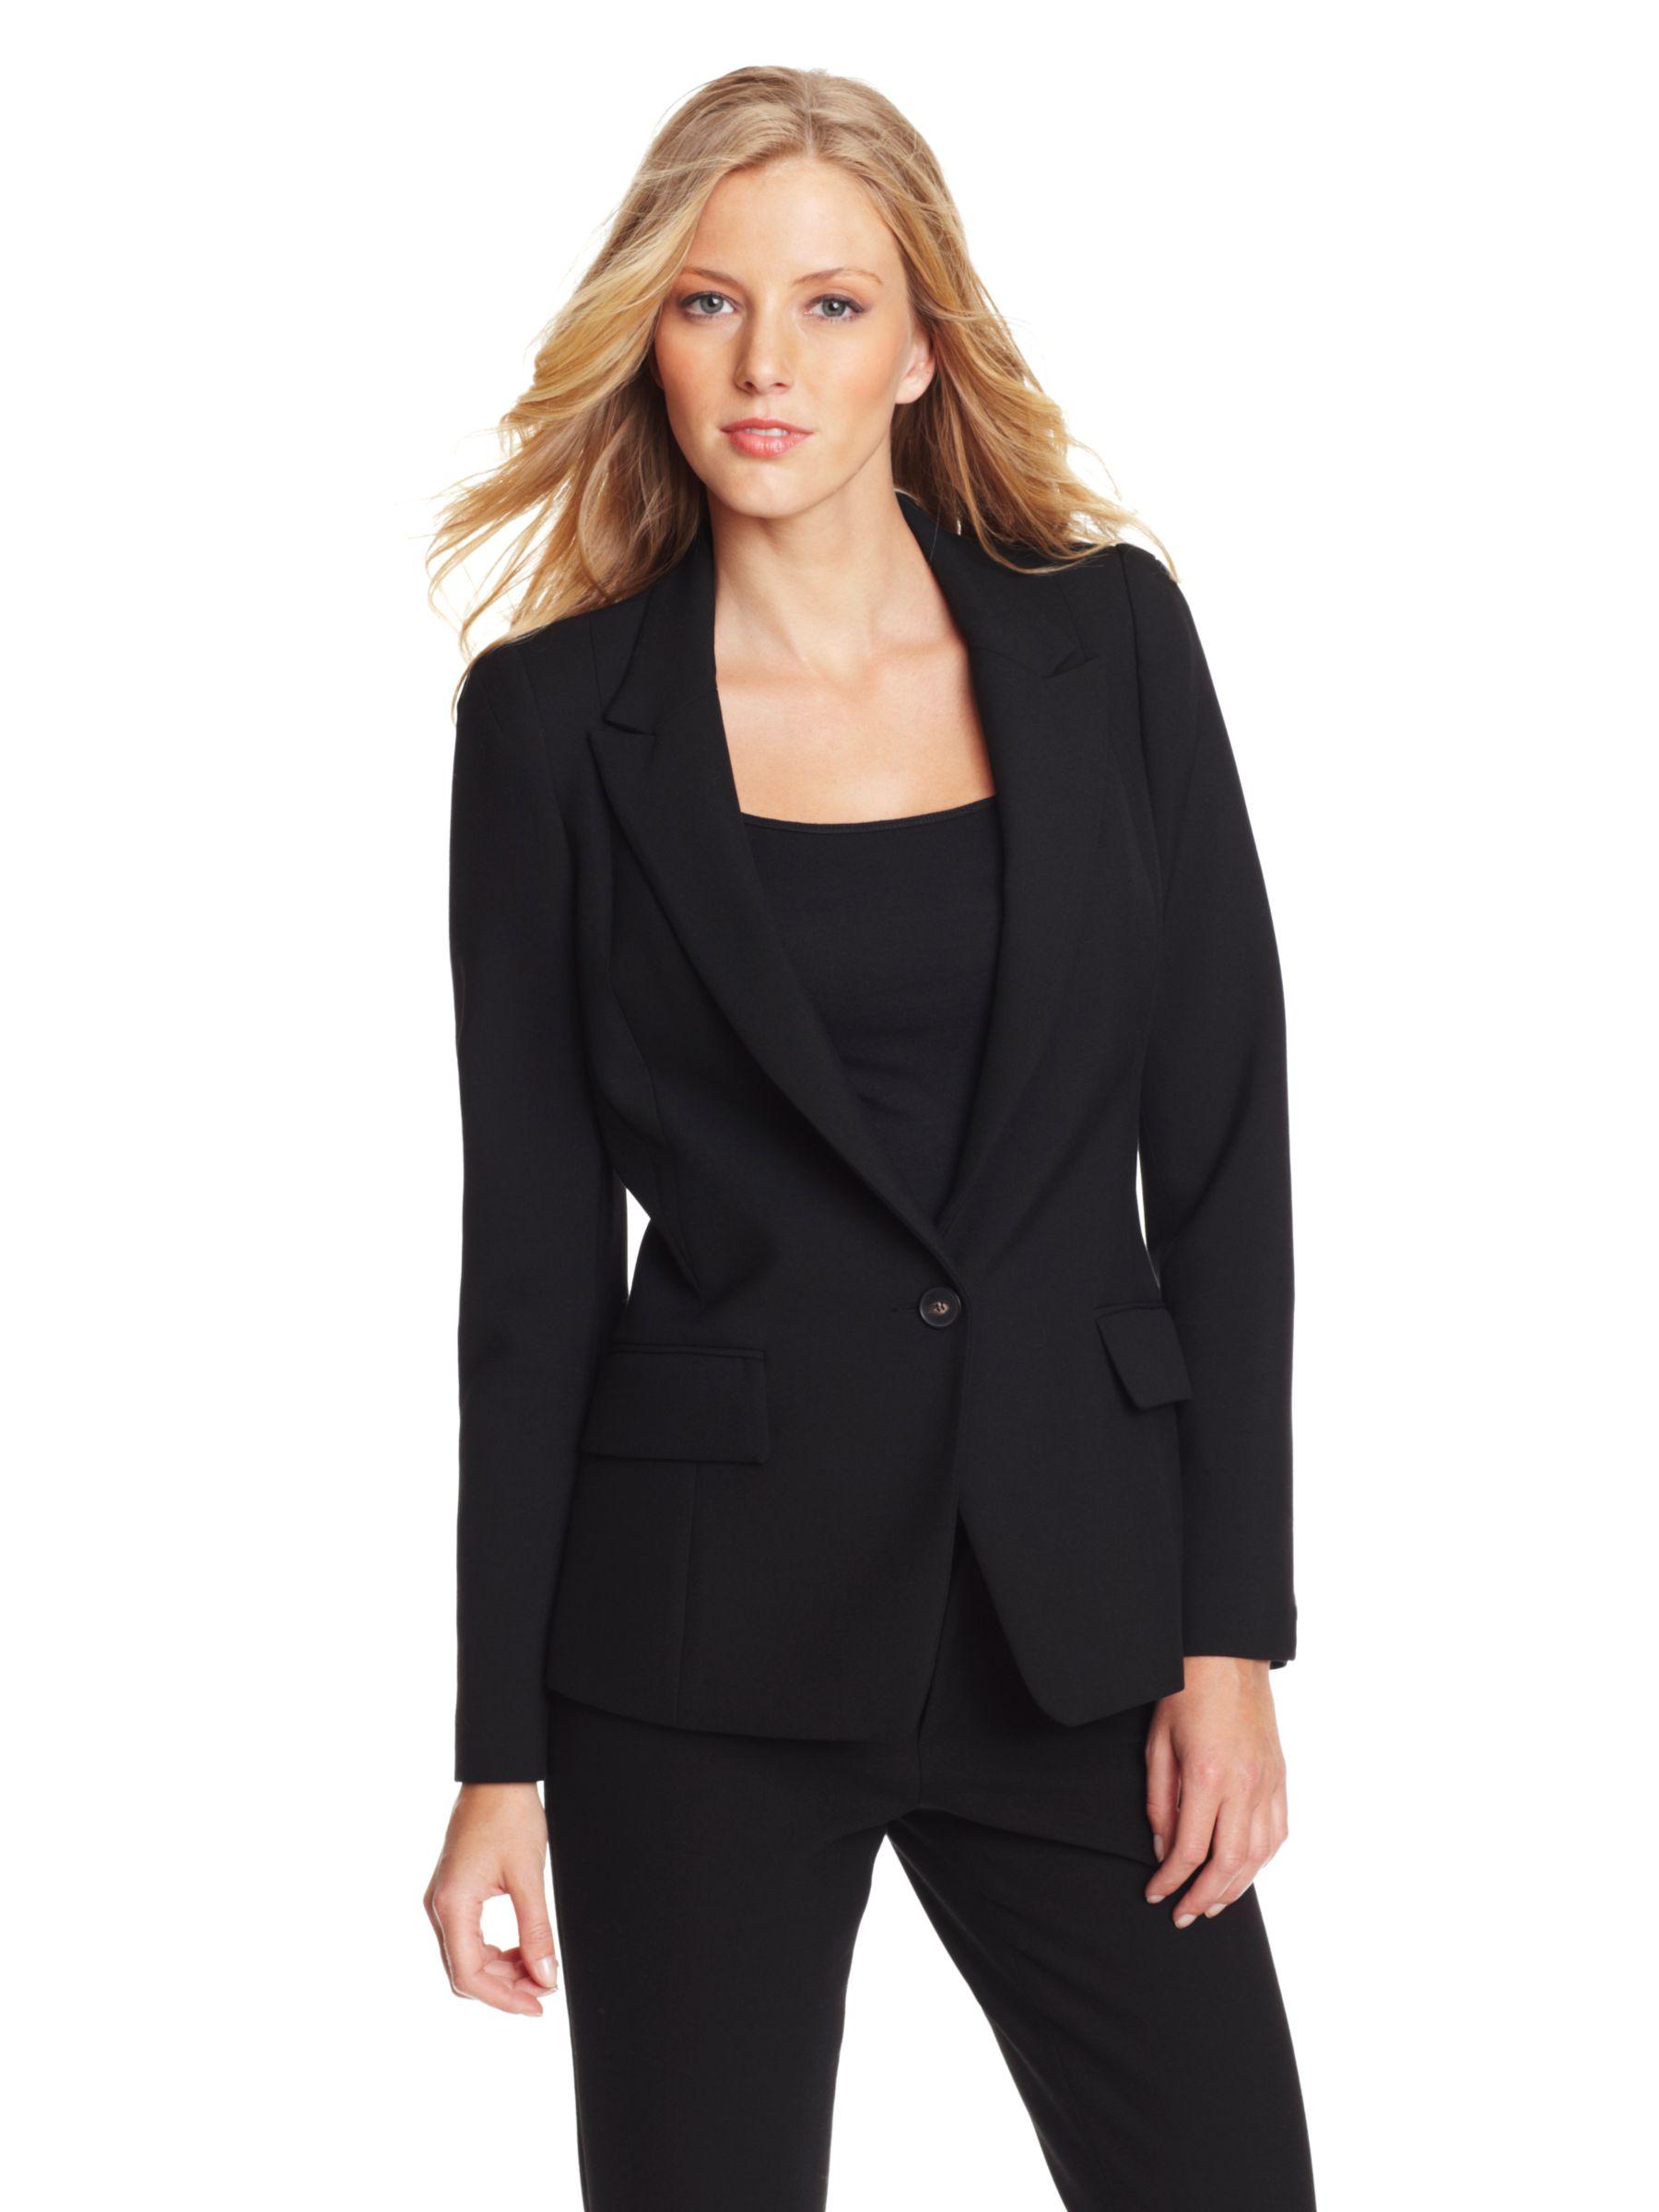 Gérard Darel One Button Suit Jacket, Black at John Lewis